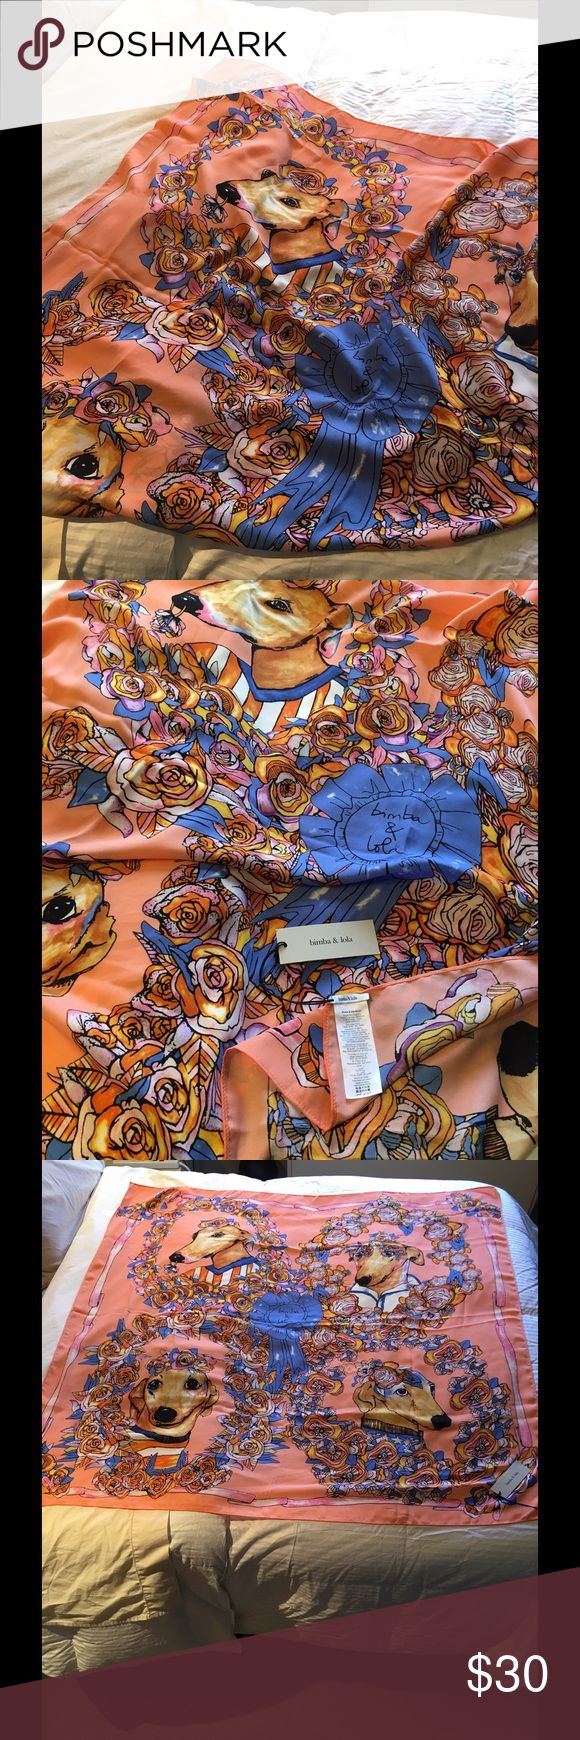 "Bimba y Lola gorgeous scarf shawl 47"" square colorfully beautiful imported scarf/shawl; 100% polyester; machine washable. Bimba y Lola Accessories Scarves & Wraps"